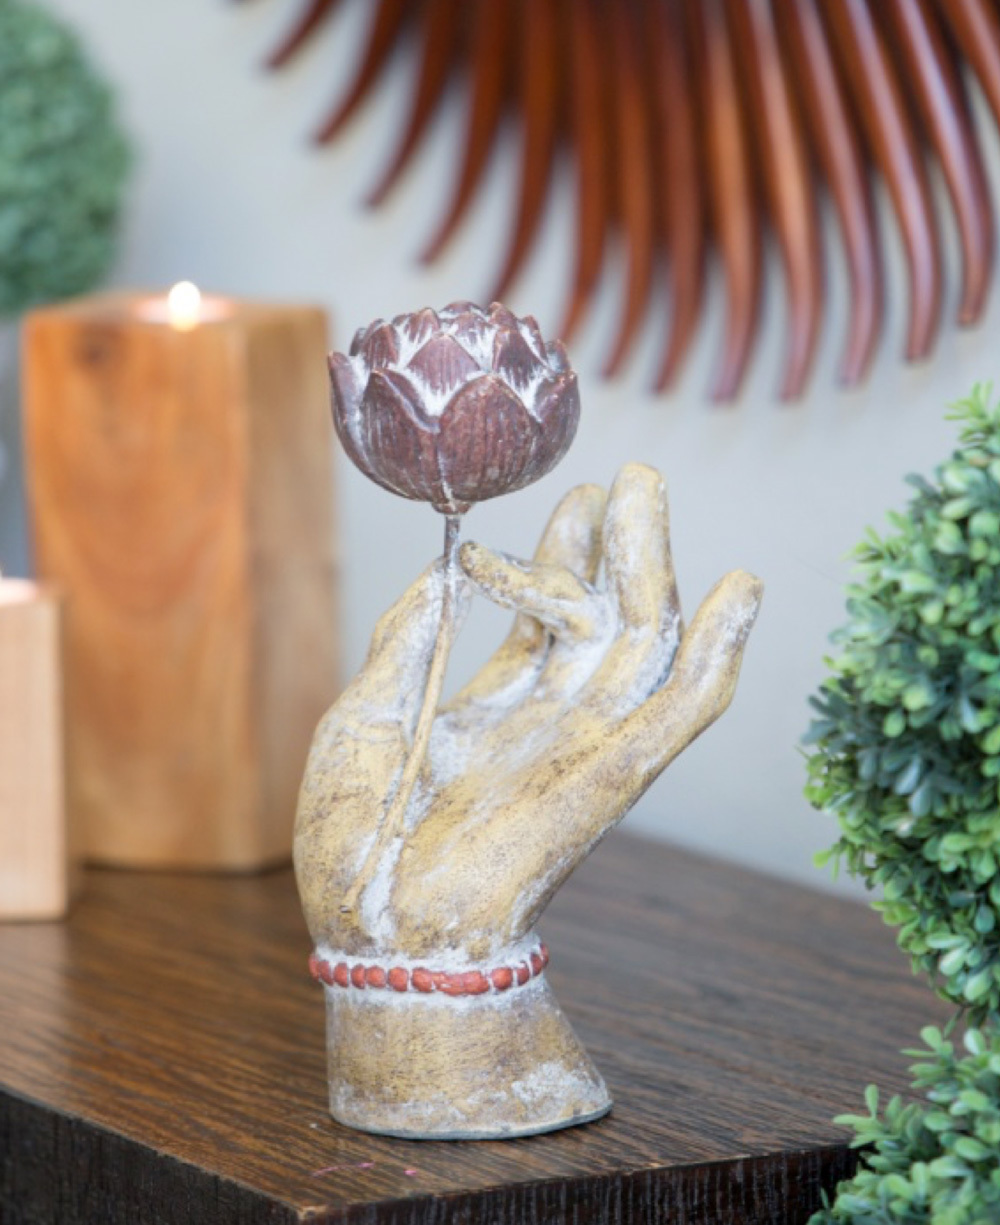 Mudra Hand and Lotus Garden Statue